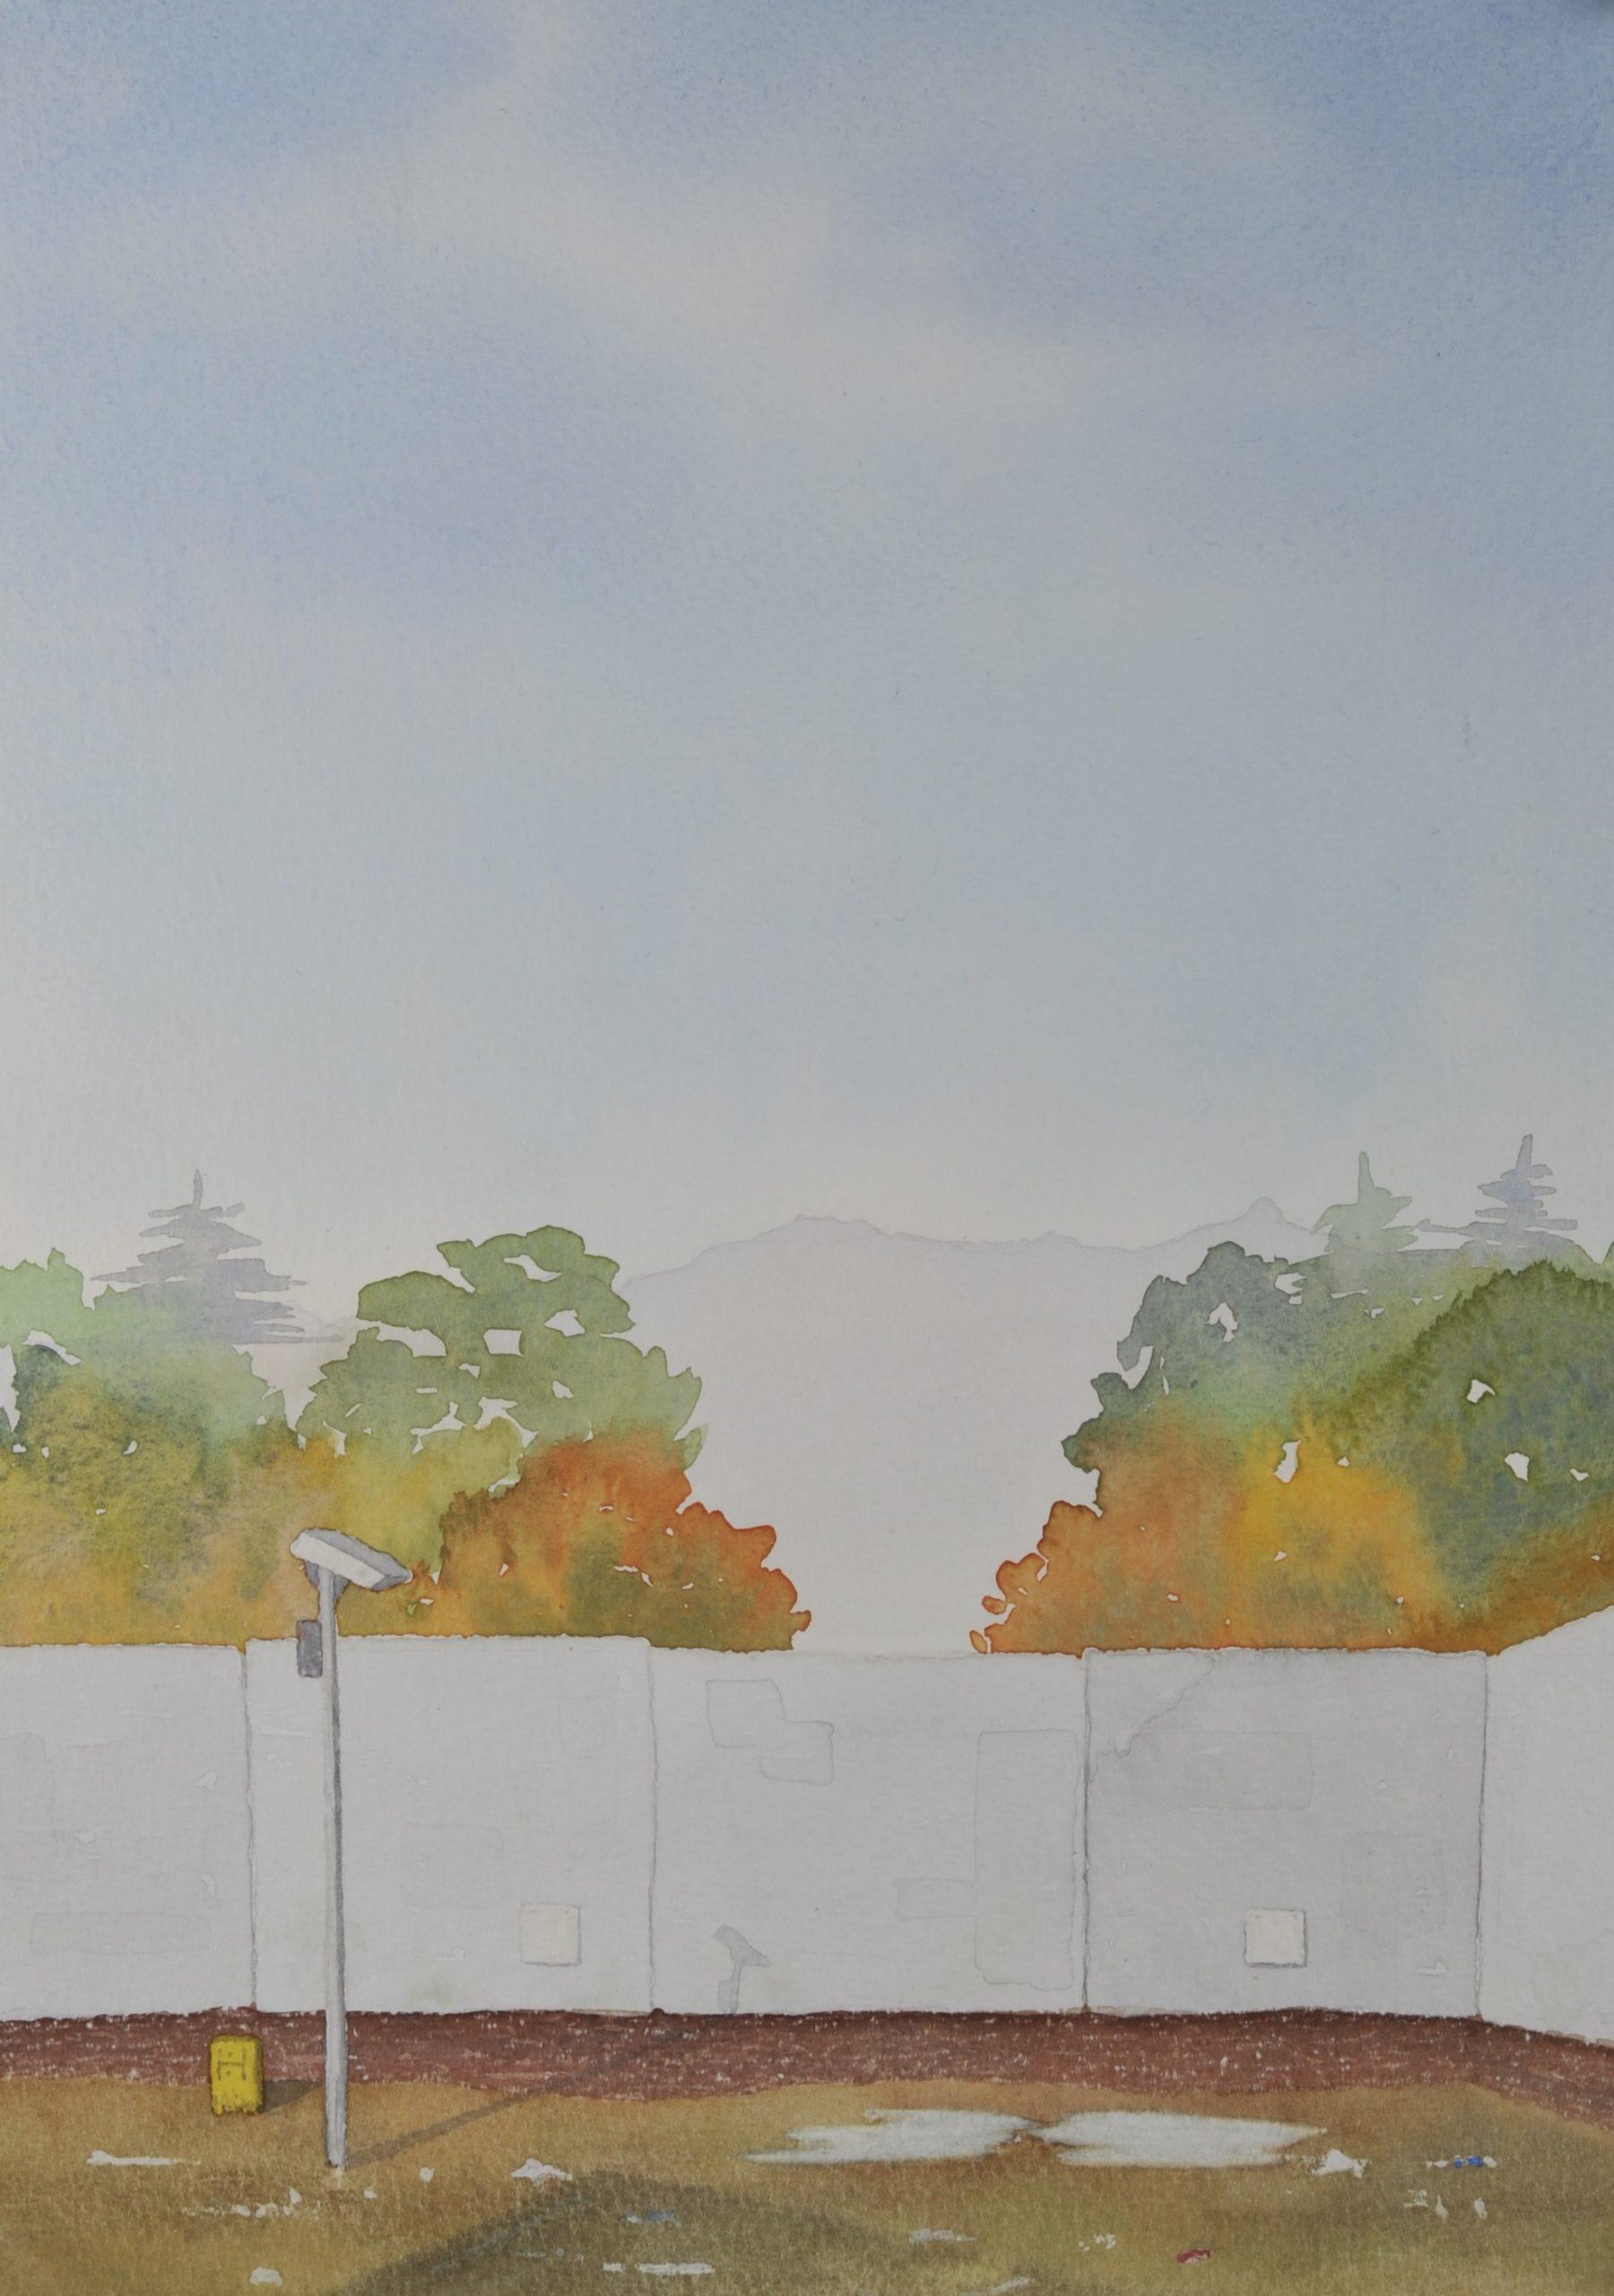 Beyond the Wall, HMP Glenochil, Scotland Gold Award for Watercolour